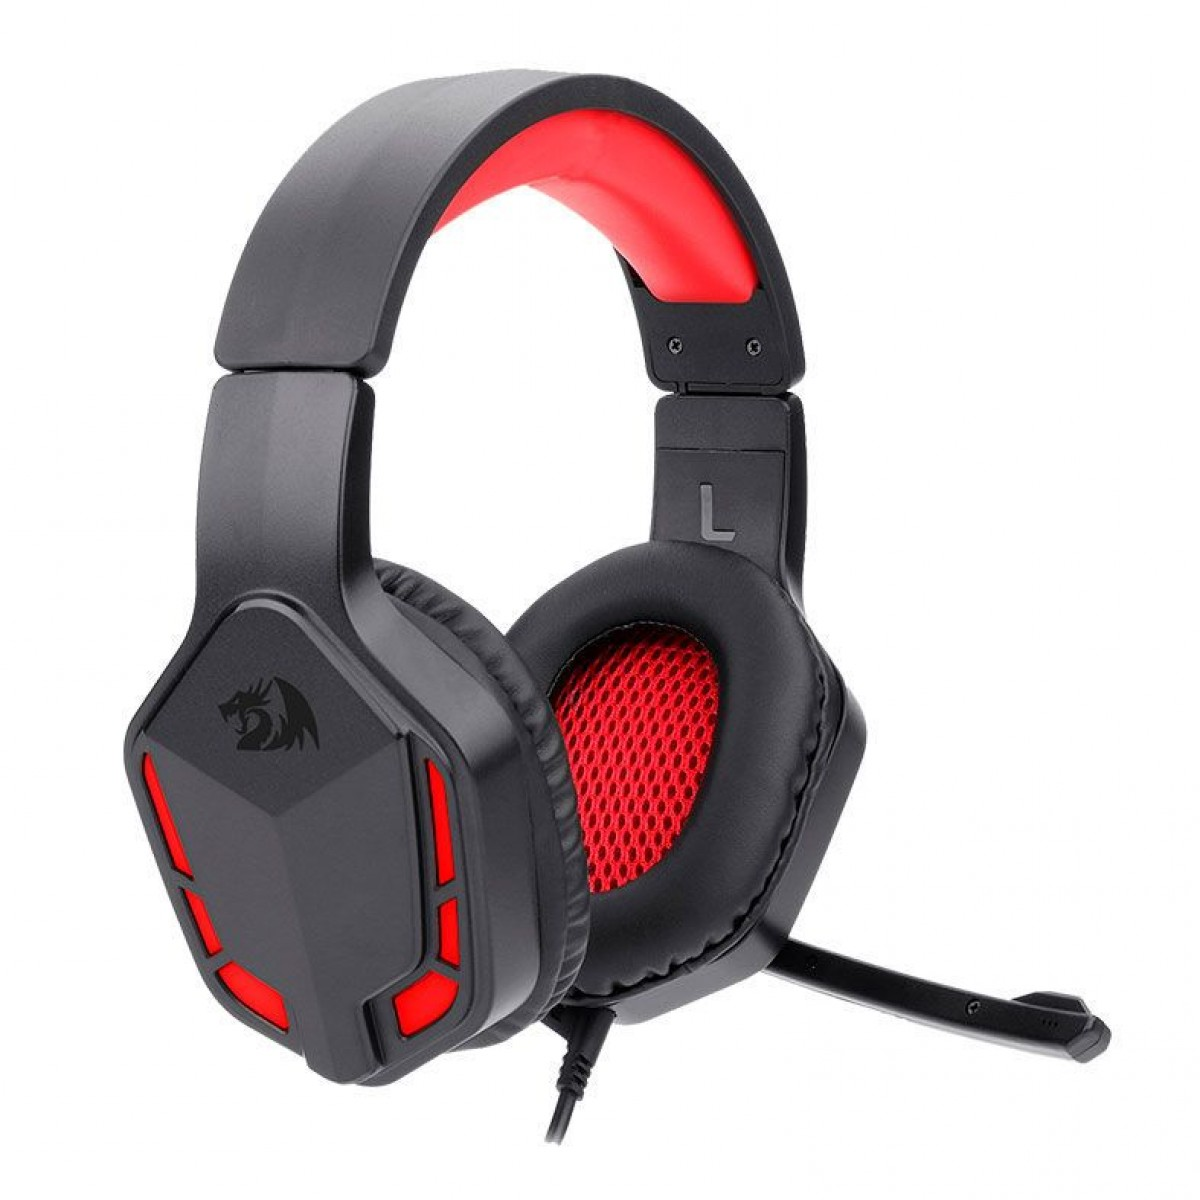 Headset Gamer Redragon Themis 2, P2, Preto, H220N